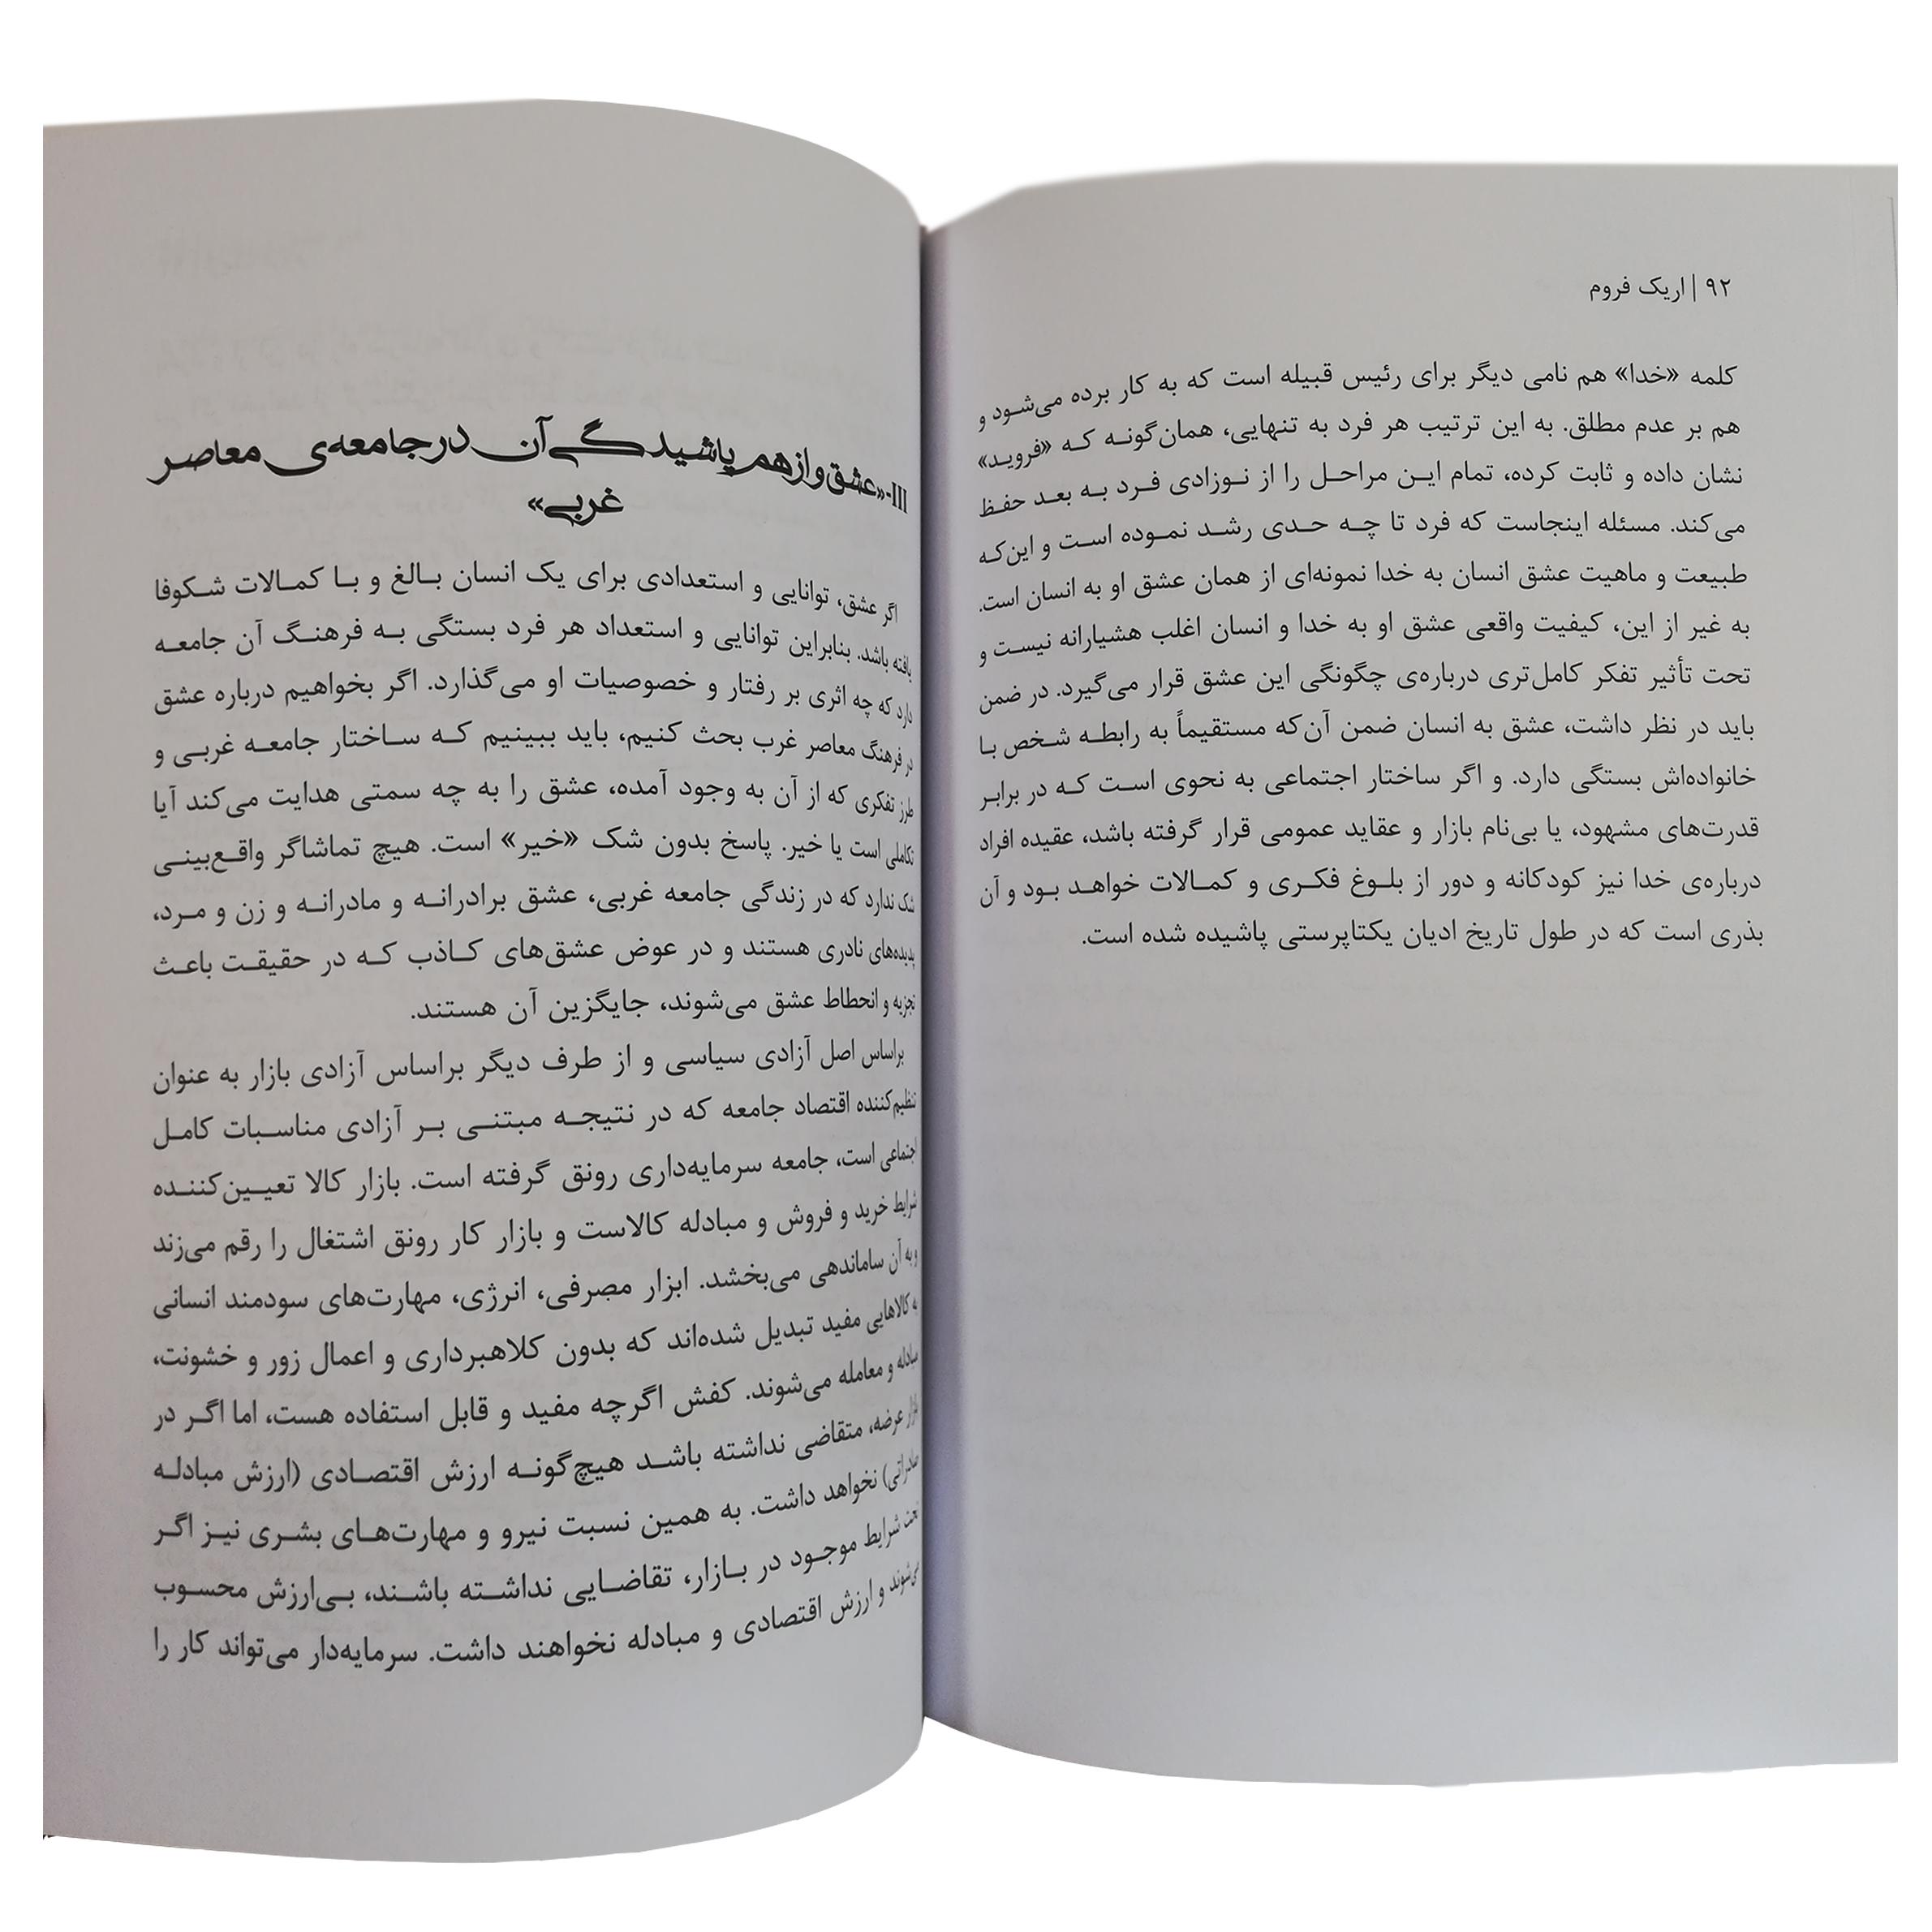 کتاب هنر عشق ورزیدن اثر اریک فروم نشر شیر محمدی thumb 3